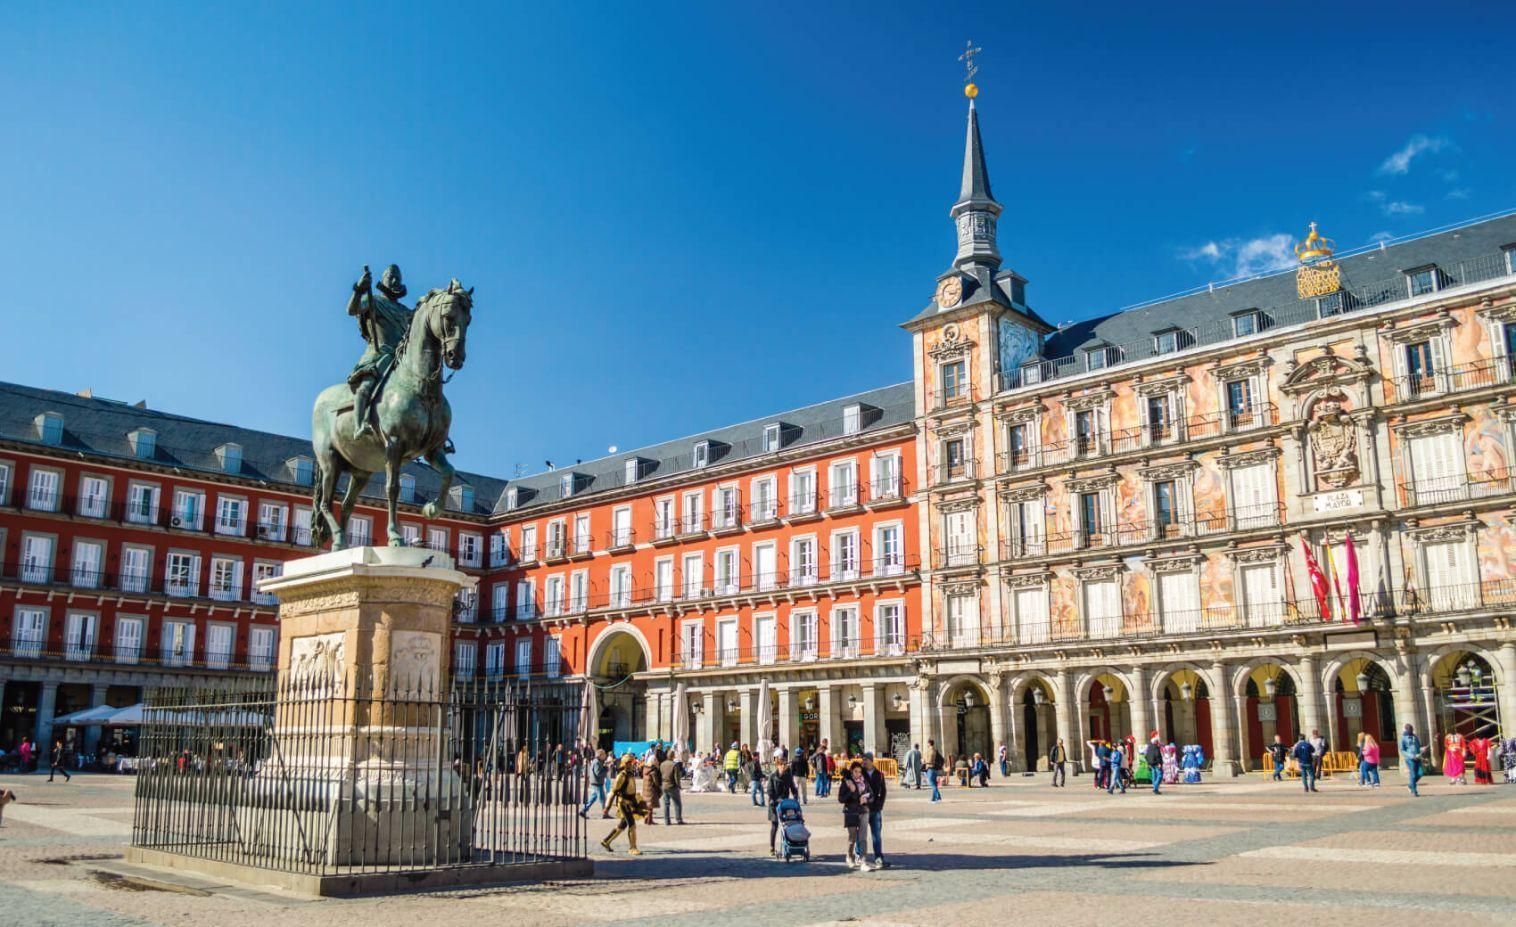 Felipe III statue and Casa de la Panaderia on Plaza Mayor in Madrid, Spain